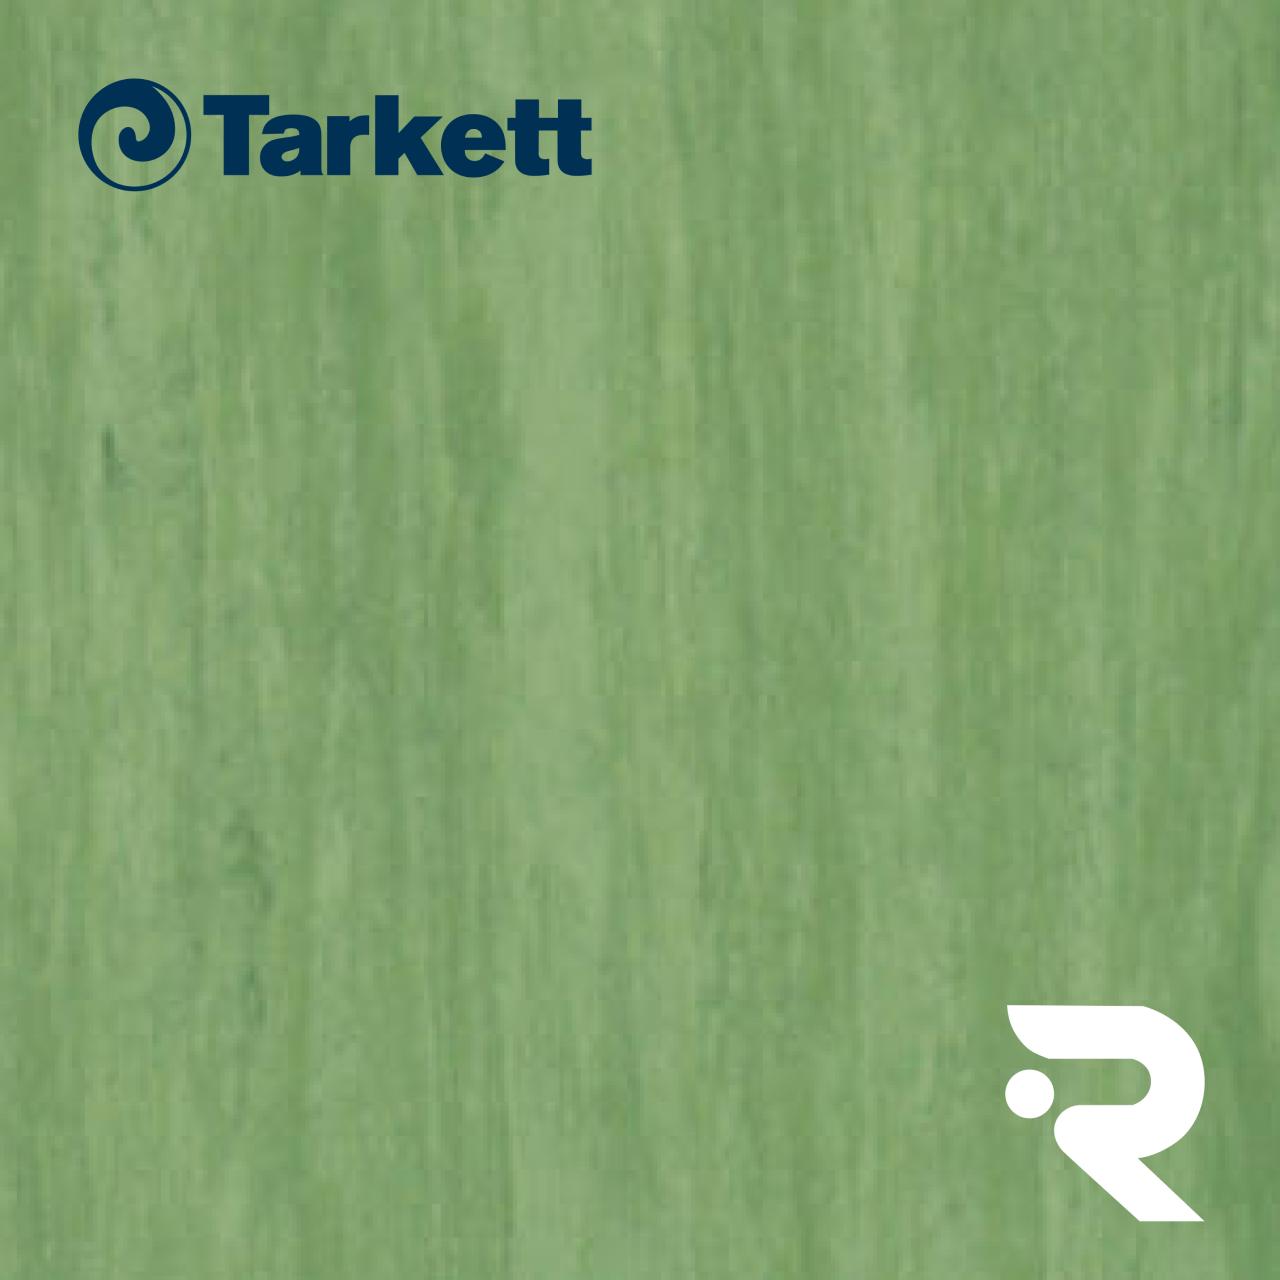 🏫 Гомогенний лінолеум Tarkett | Standard DARK GREEN 0921 | Standard Plus 2.0 mm | 610 х 610 мм